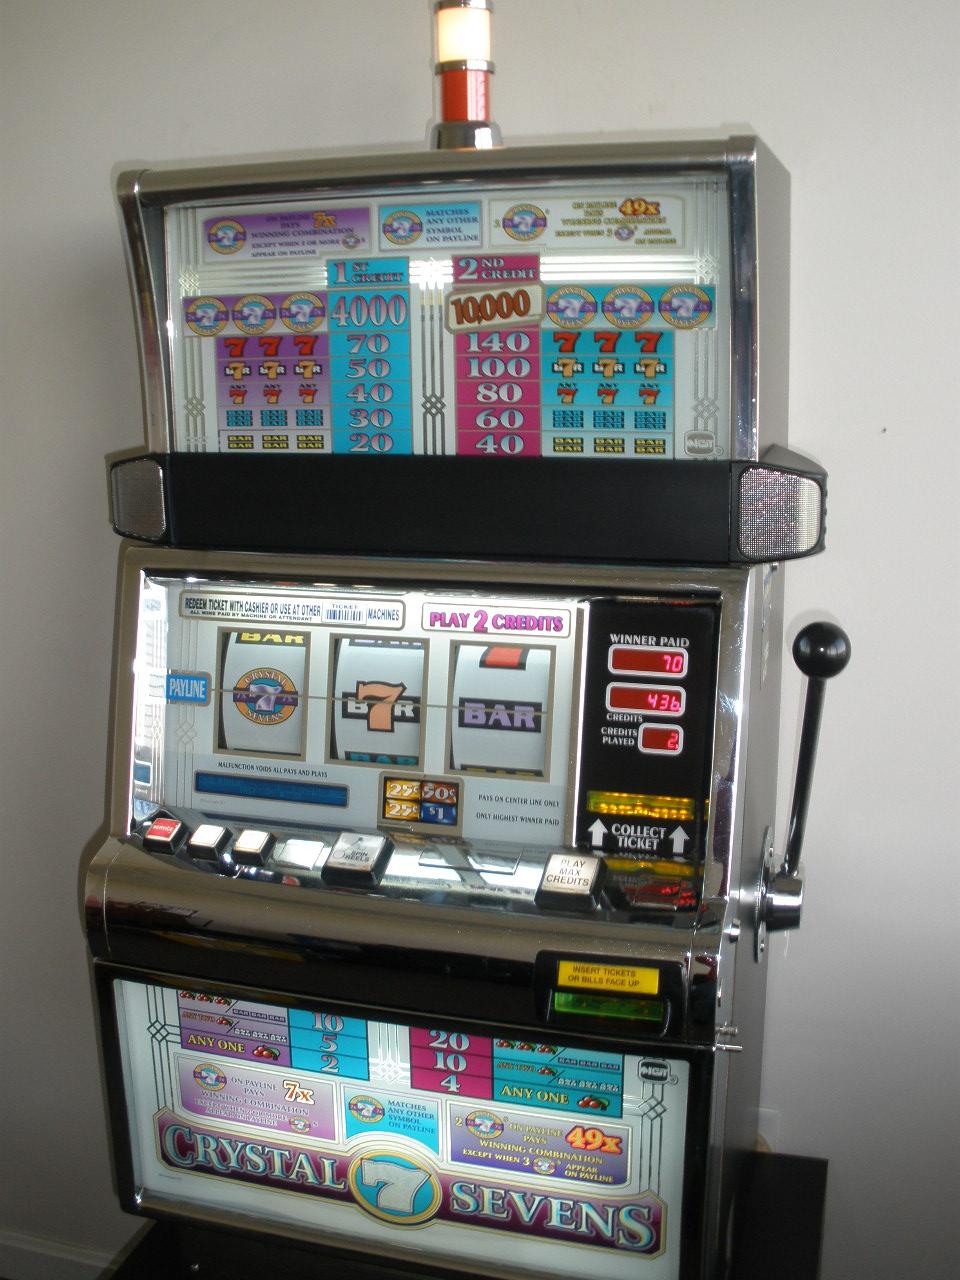 Igt Crystal Sevens S2000 Flat Top Slot Machine For Sale